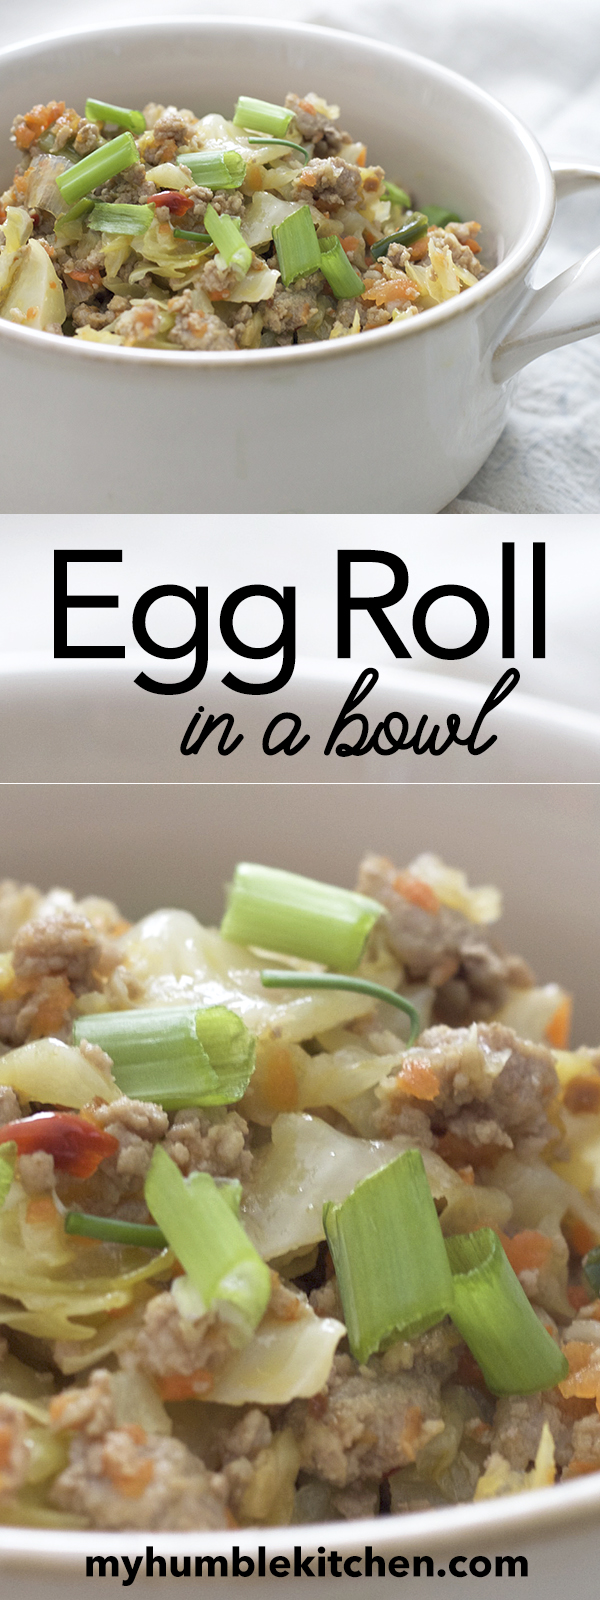 Egg Roll in a Bowl | myhumblekitchen.com